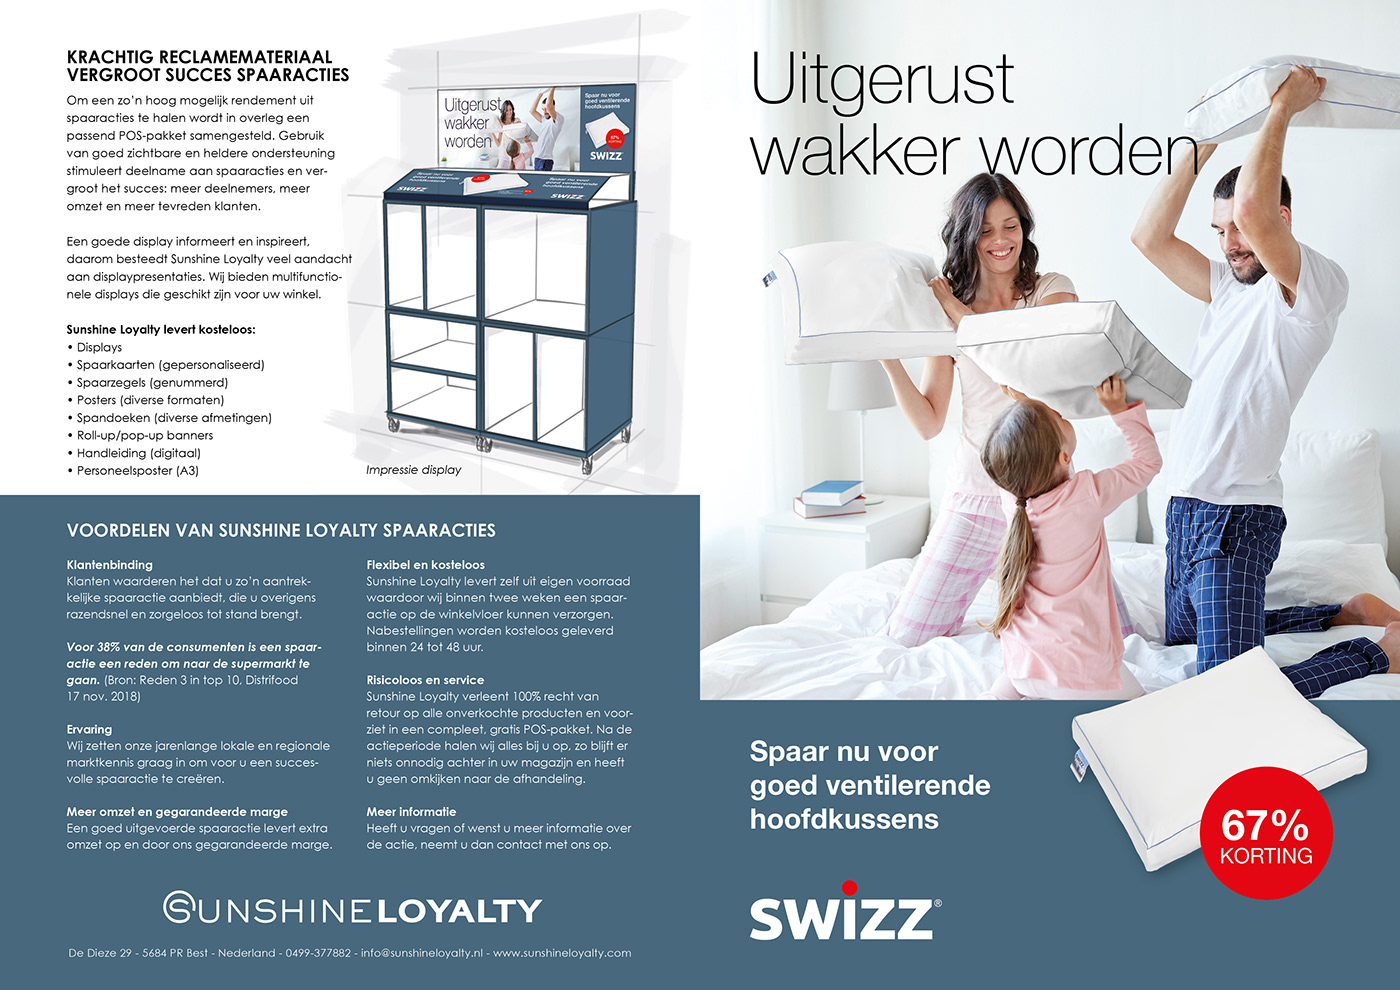 bed rebranding SALES PROMOTION Brand activation Loyalty Marketing loyalty